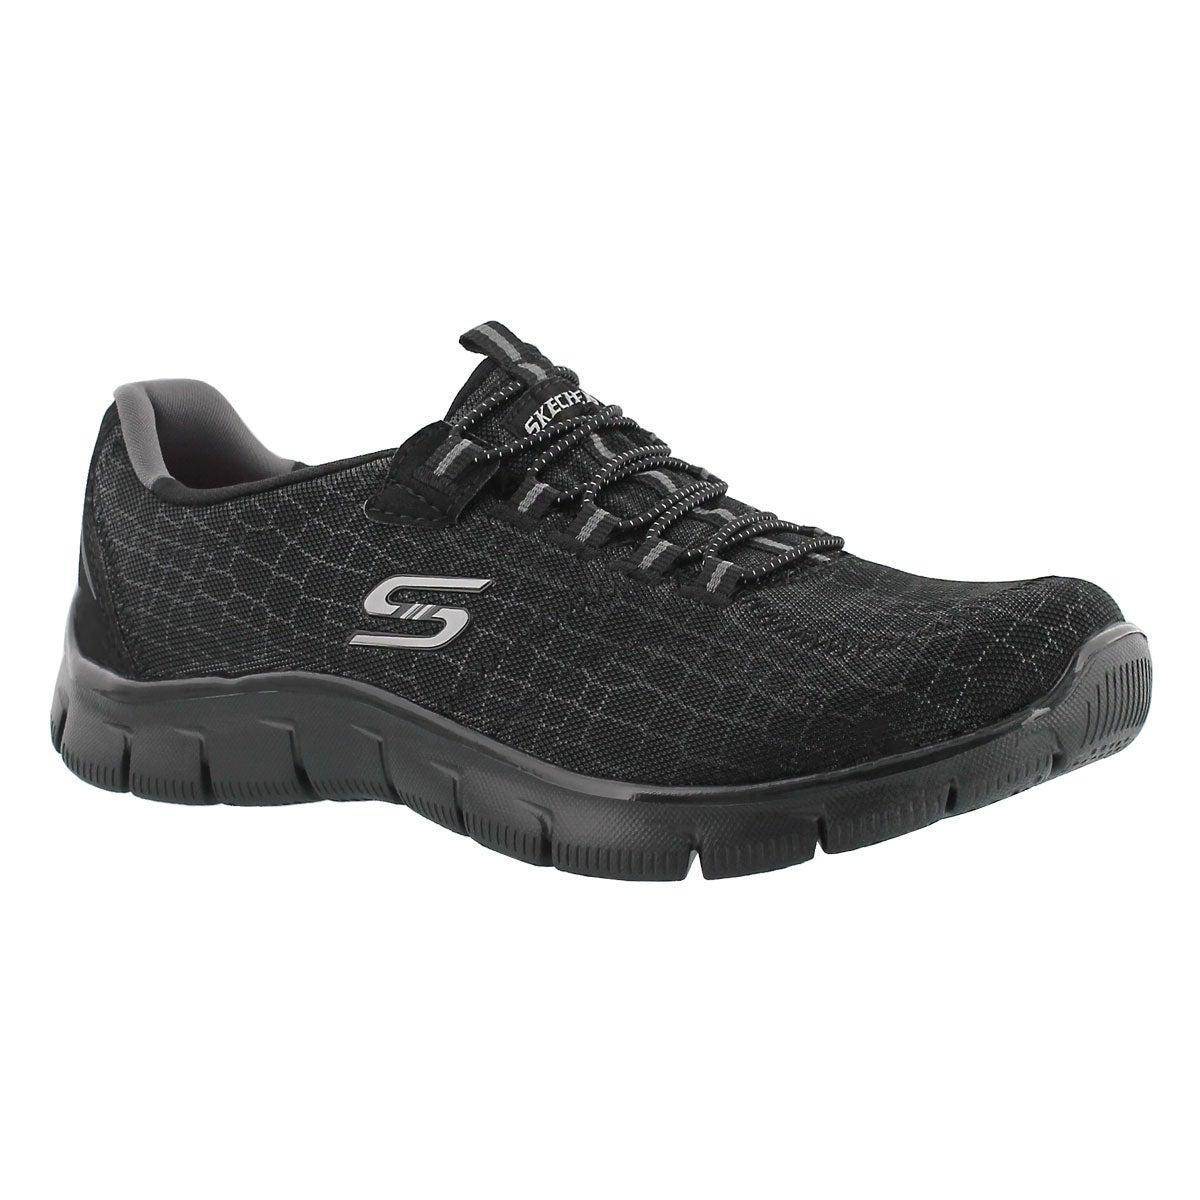 Lds Rock Around black slip on sneaker